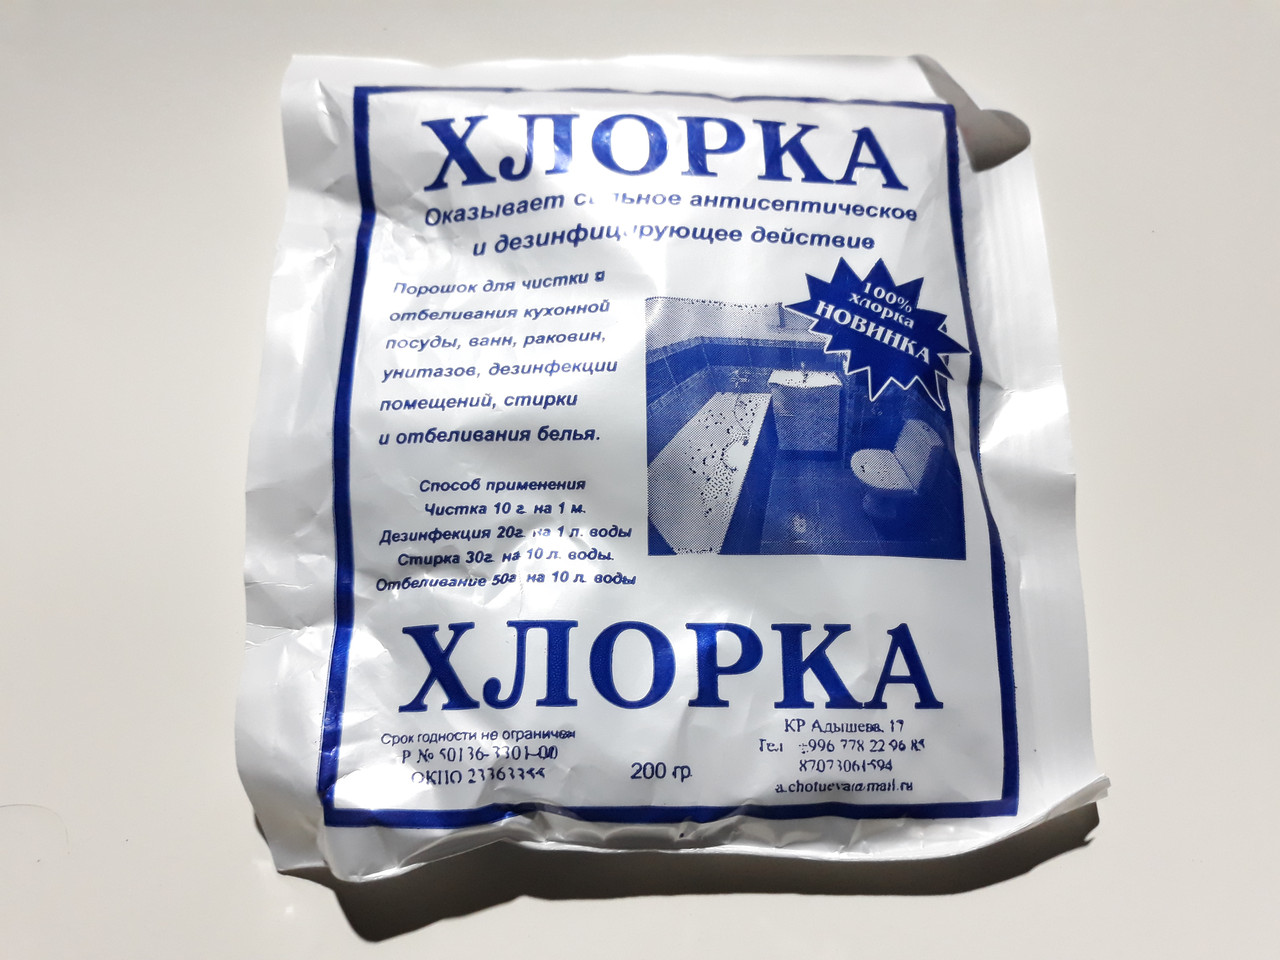 Хлорка   Фирменная Большая.  200гр./ 180 гр.